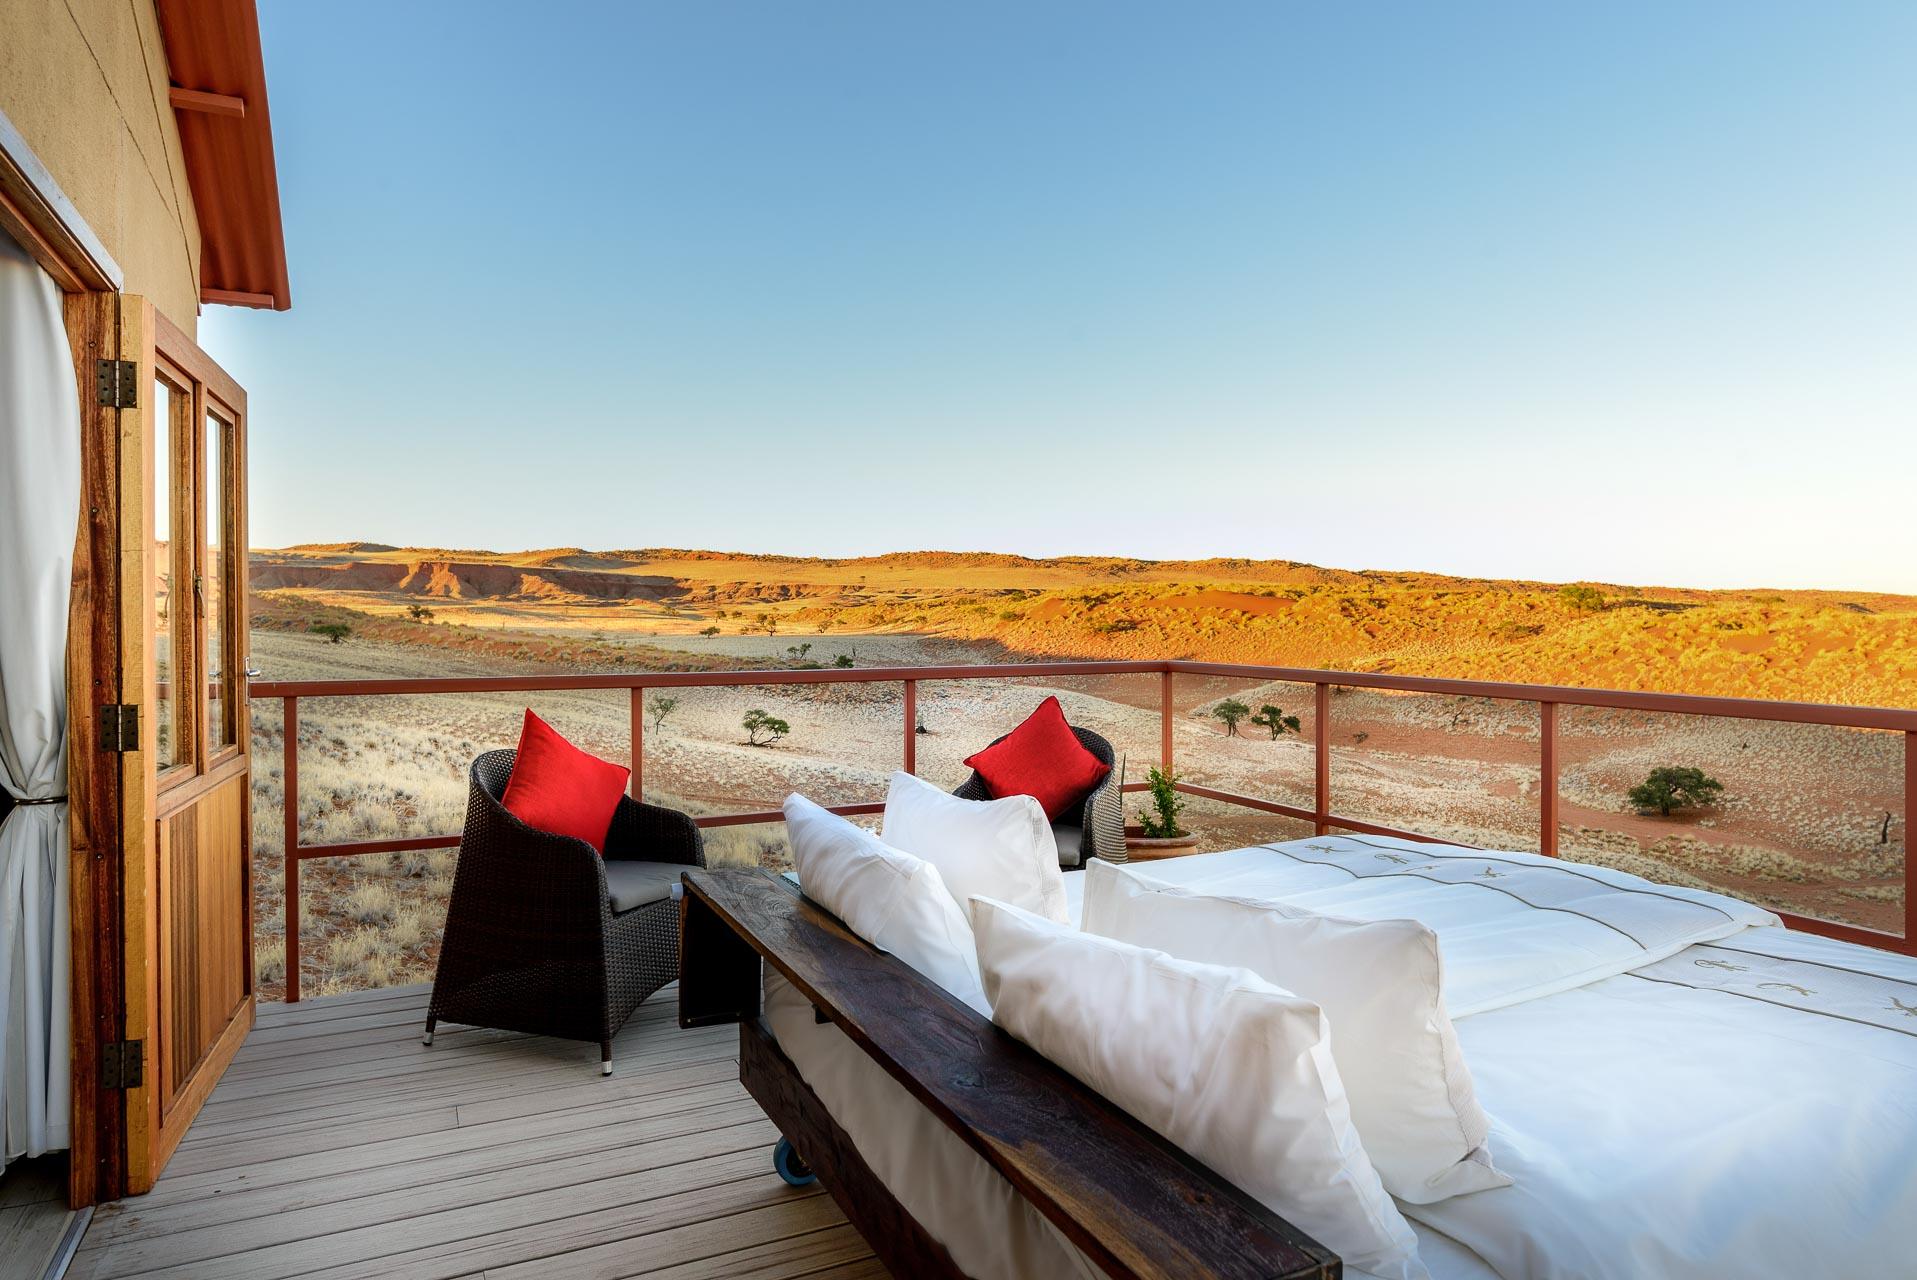 Namib-Dune-Star-Camp-18